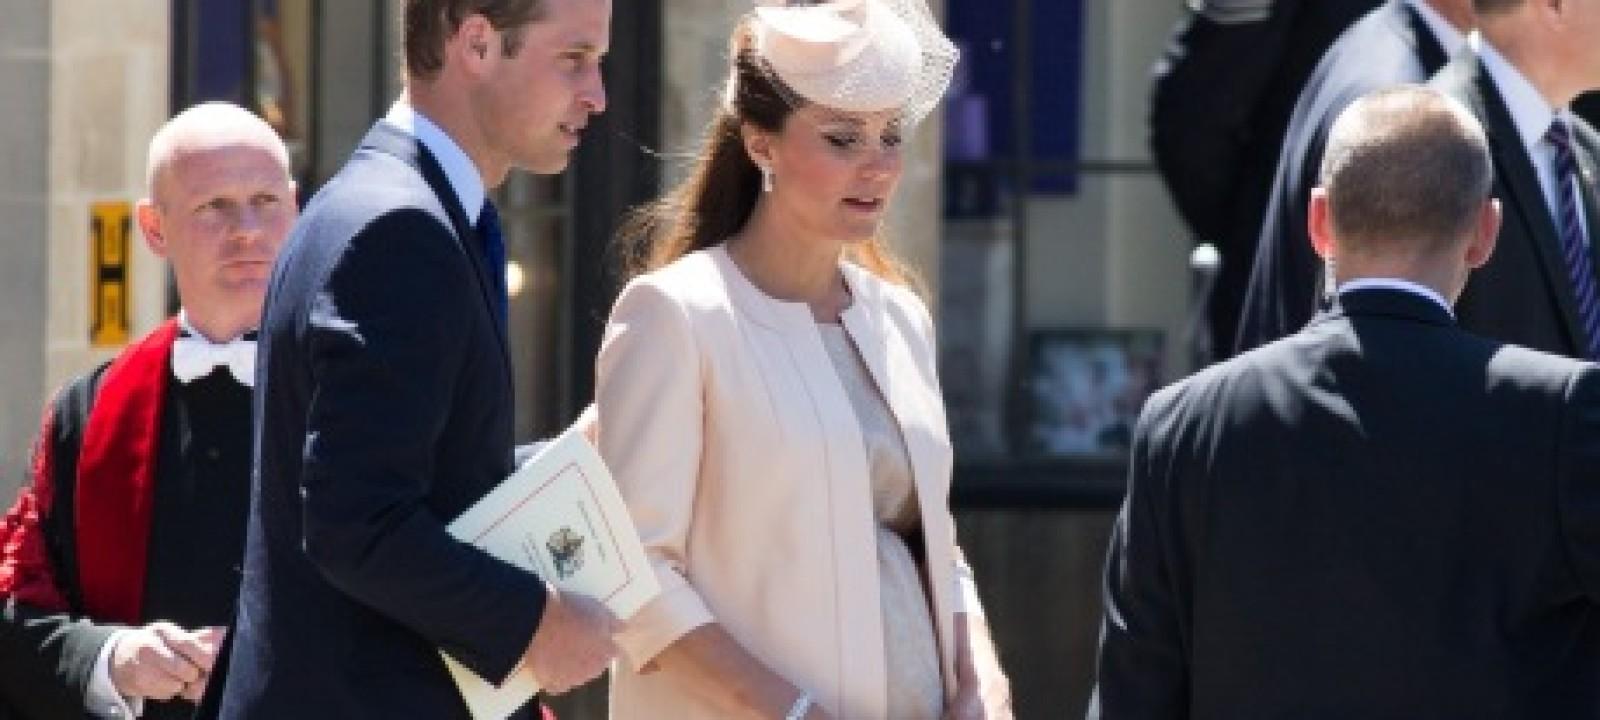 Prince William & The Duchess of Cambridge